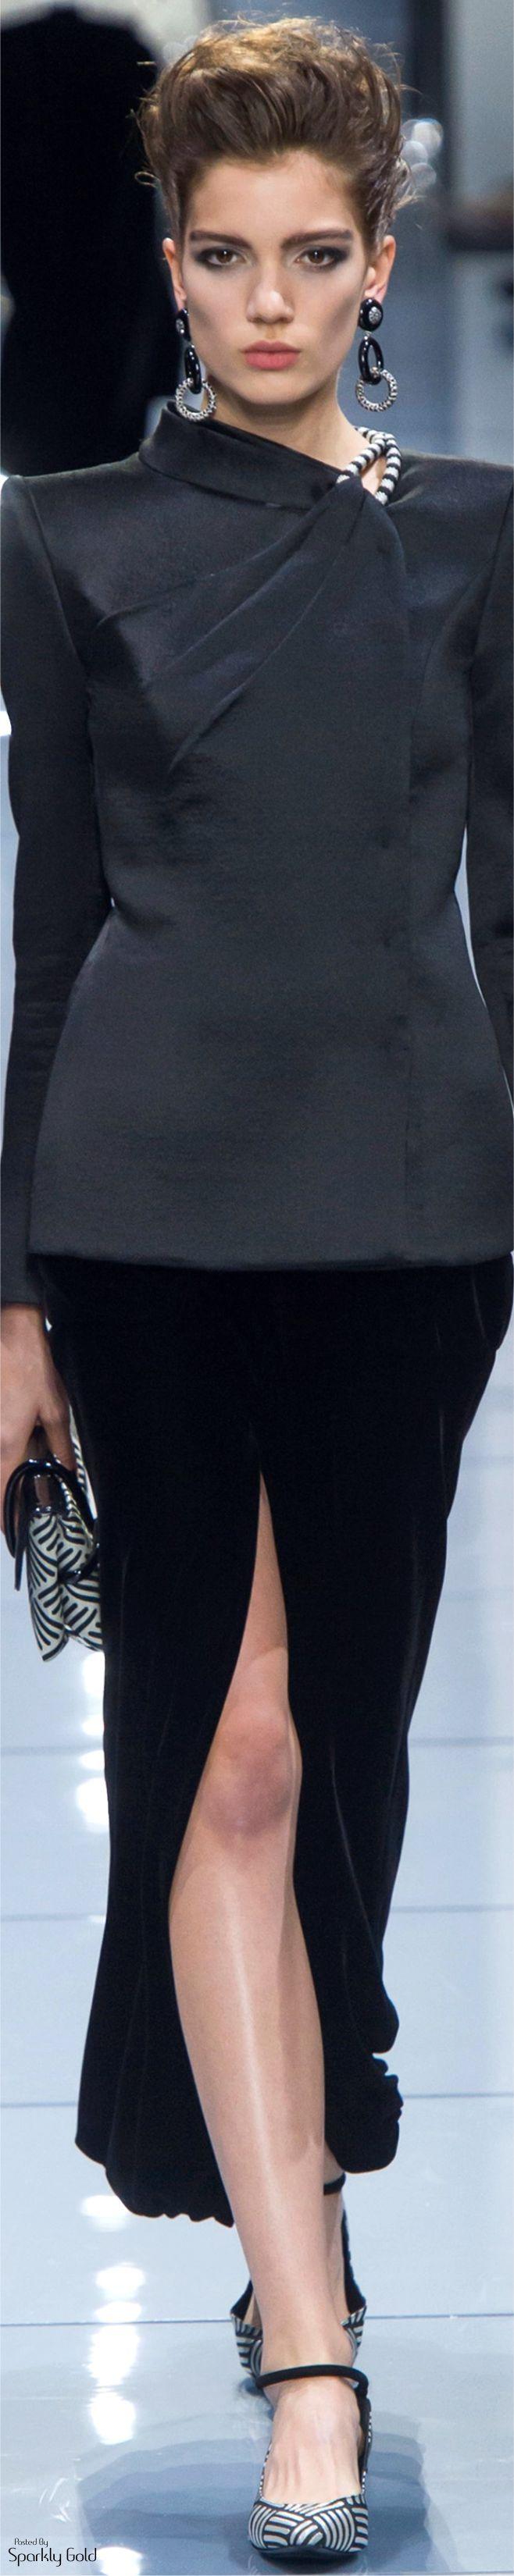 Giorgio Armani Privé Fall 2016 Couture ❤️